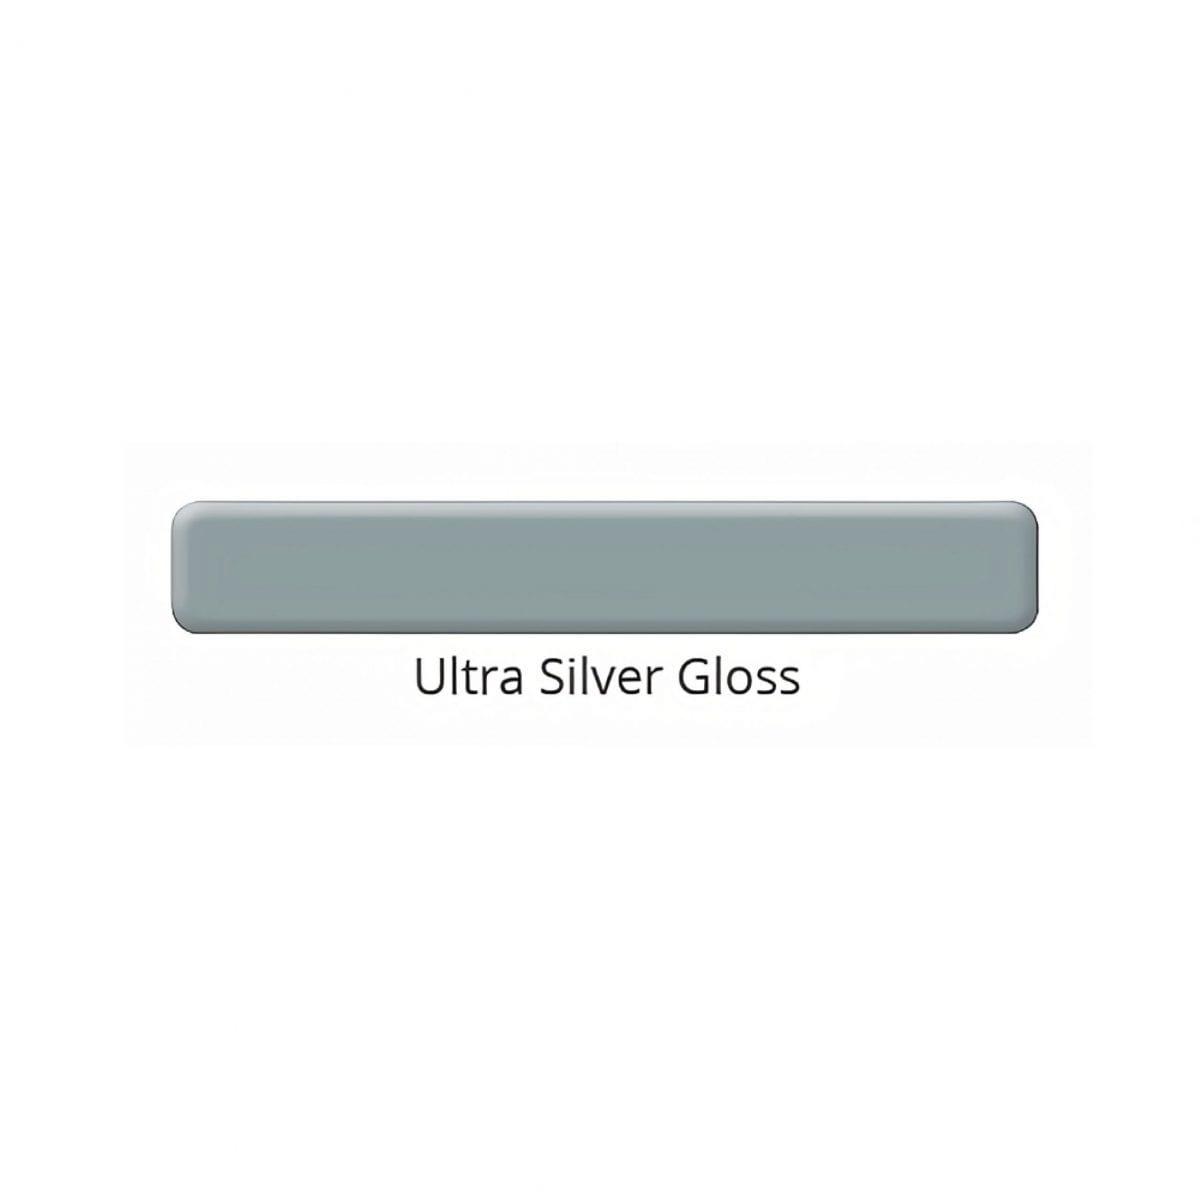 Ultra silver gloss color